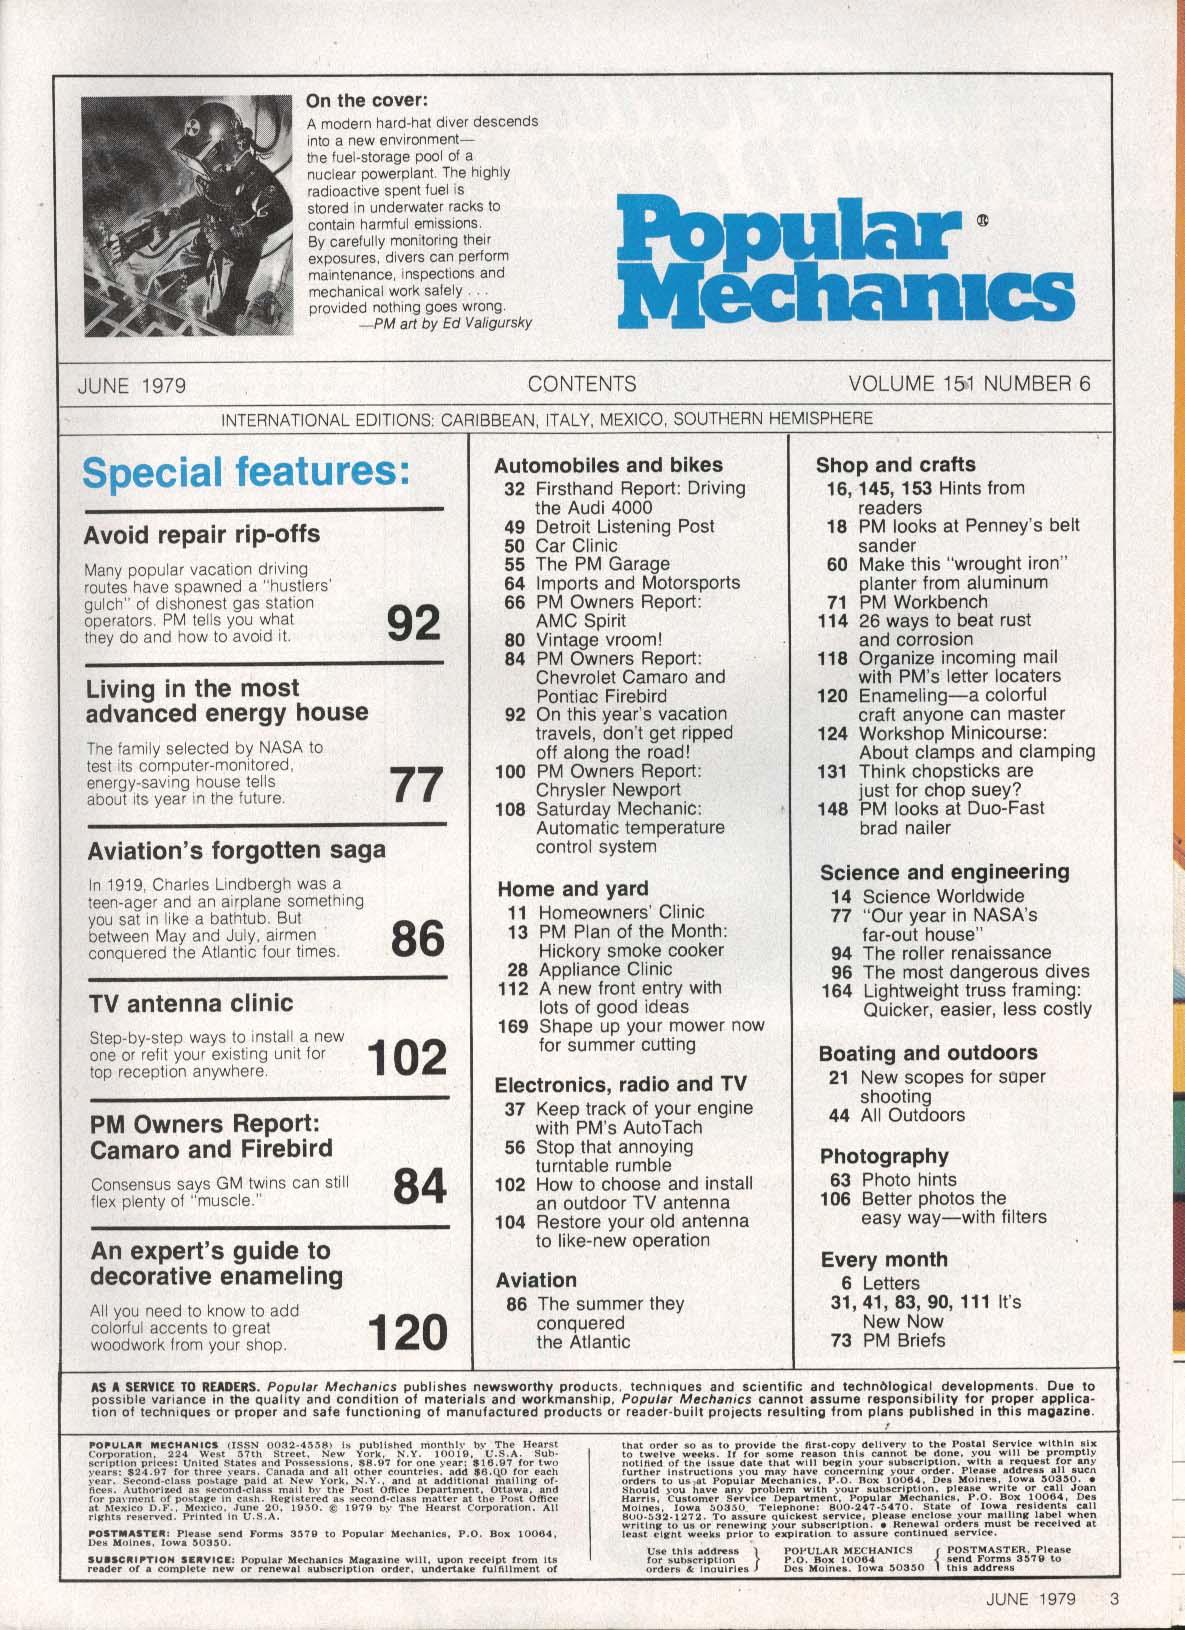 POPULAR MECHANICS Audi 4000 test; Firebird Camaro TV Antennas 6 1979